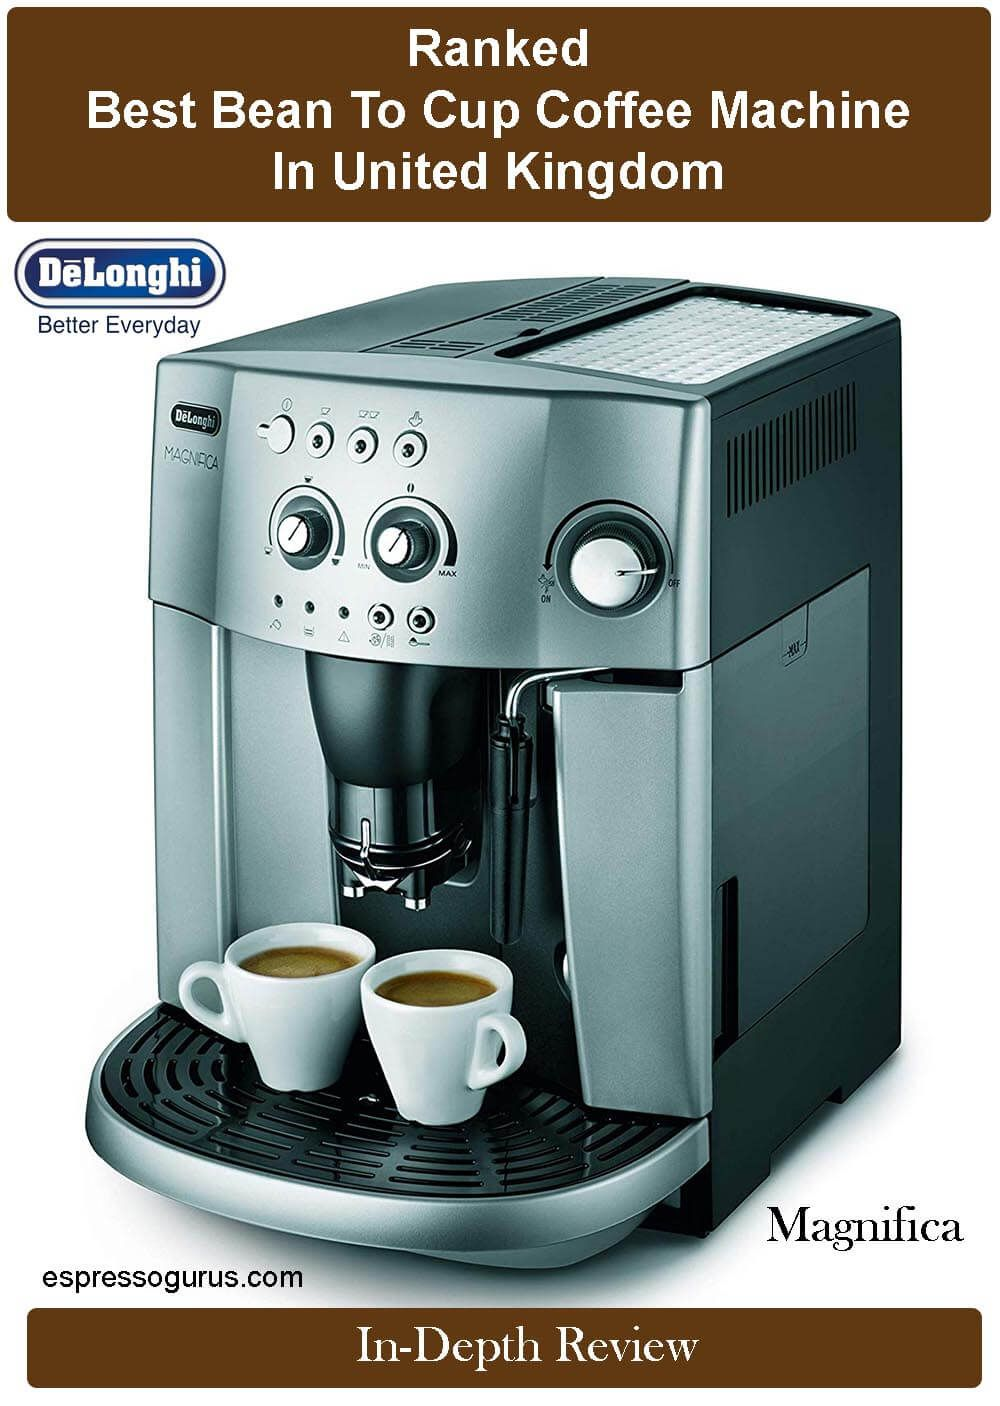 Delonghi Magnifica Best Coffee Machine In Uk Best Coffee Machines In